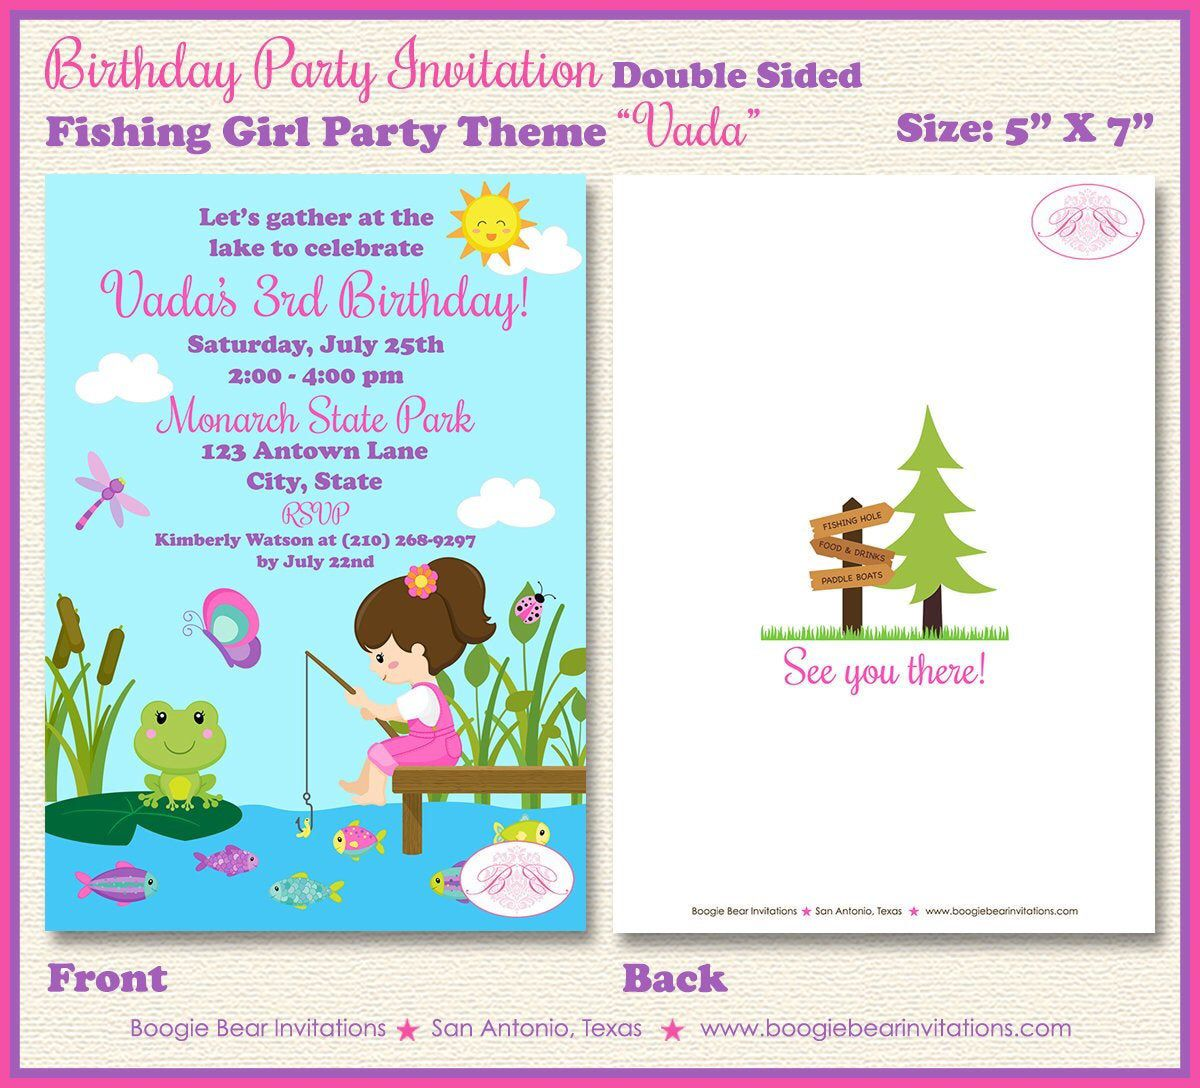 Fishing Girl Birthday Party Invitation Pink Ocean Lake